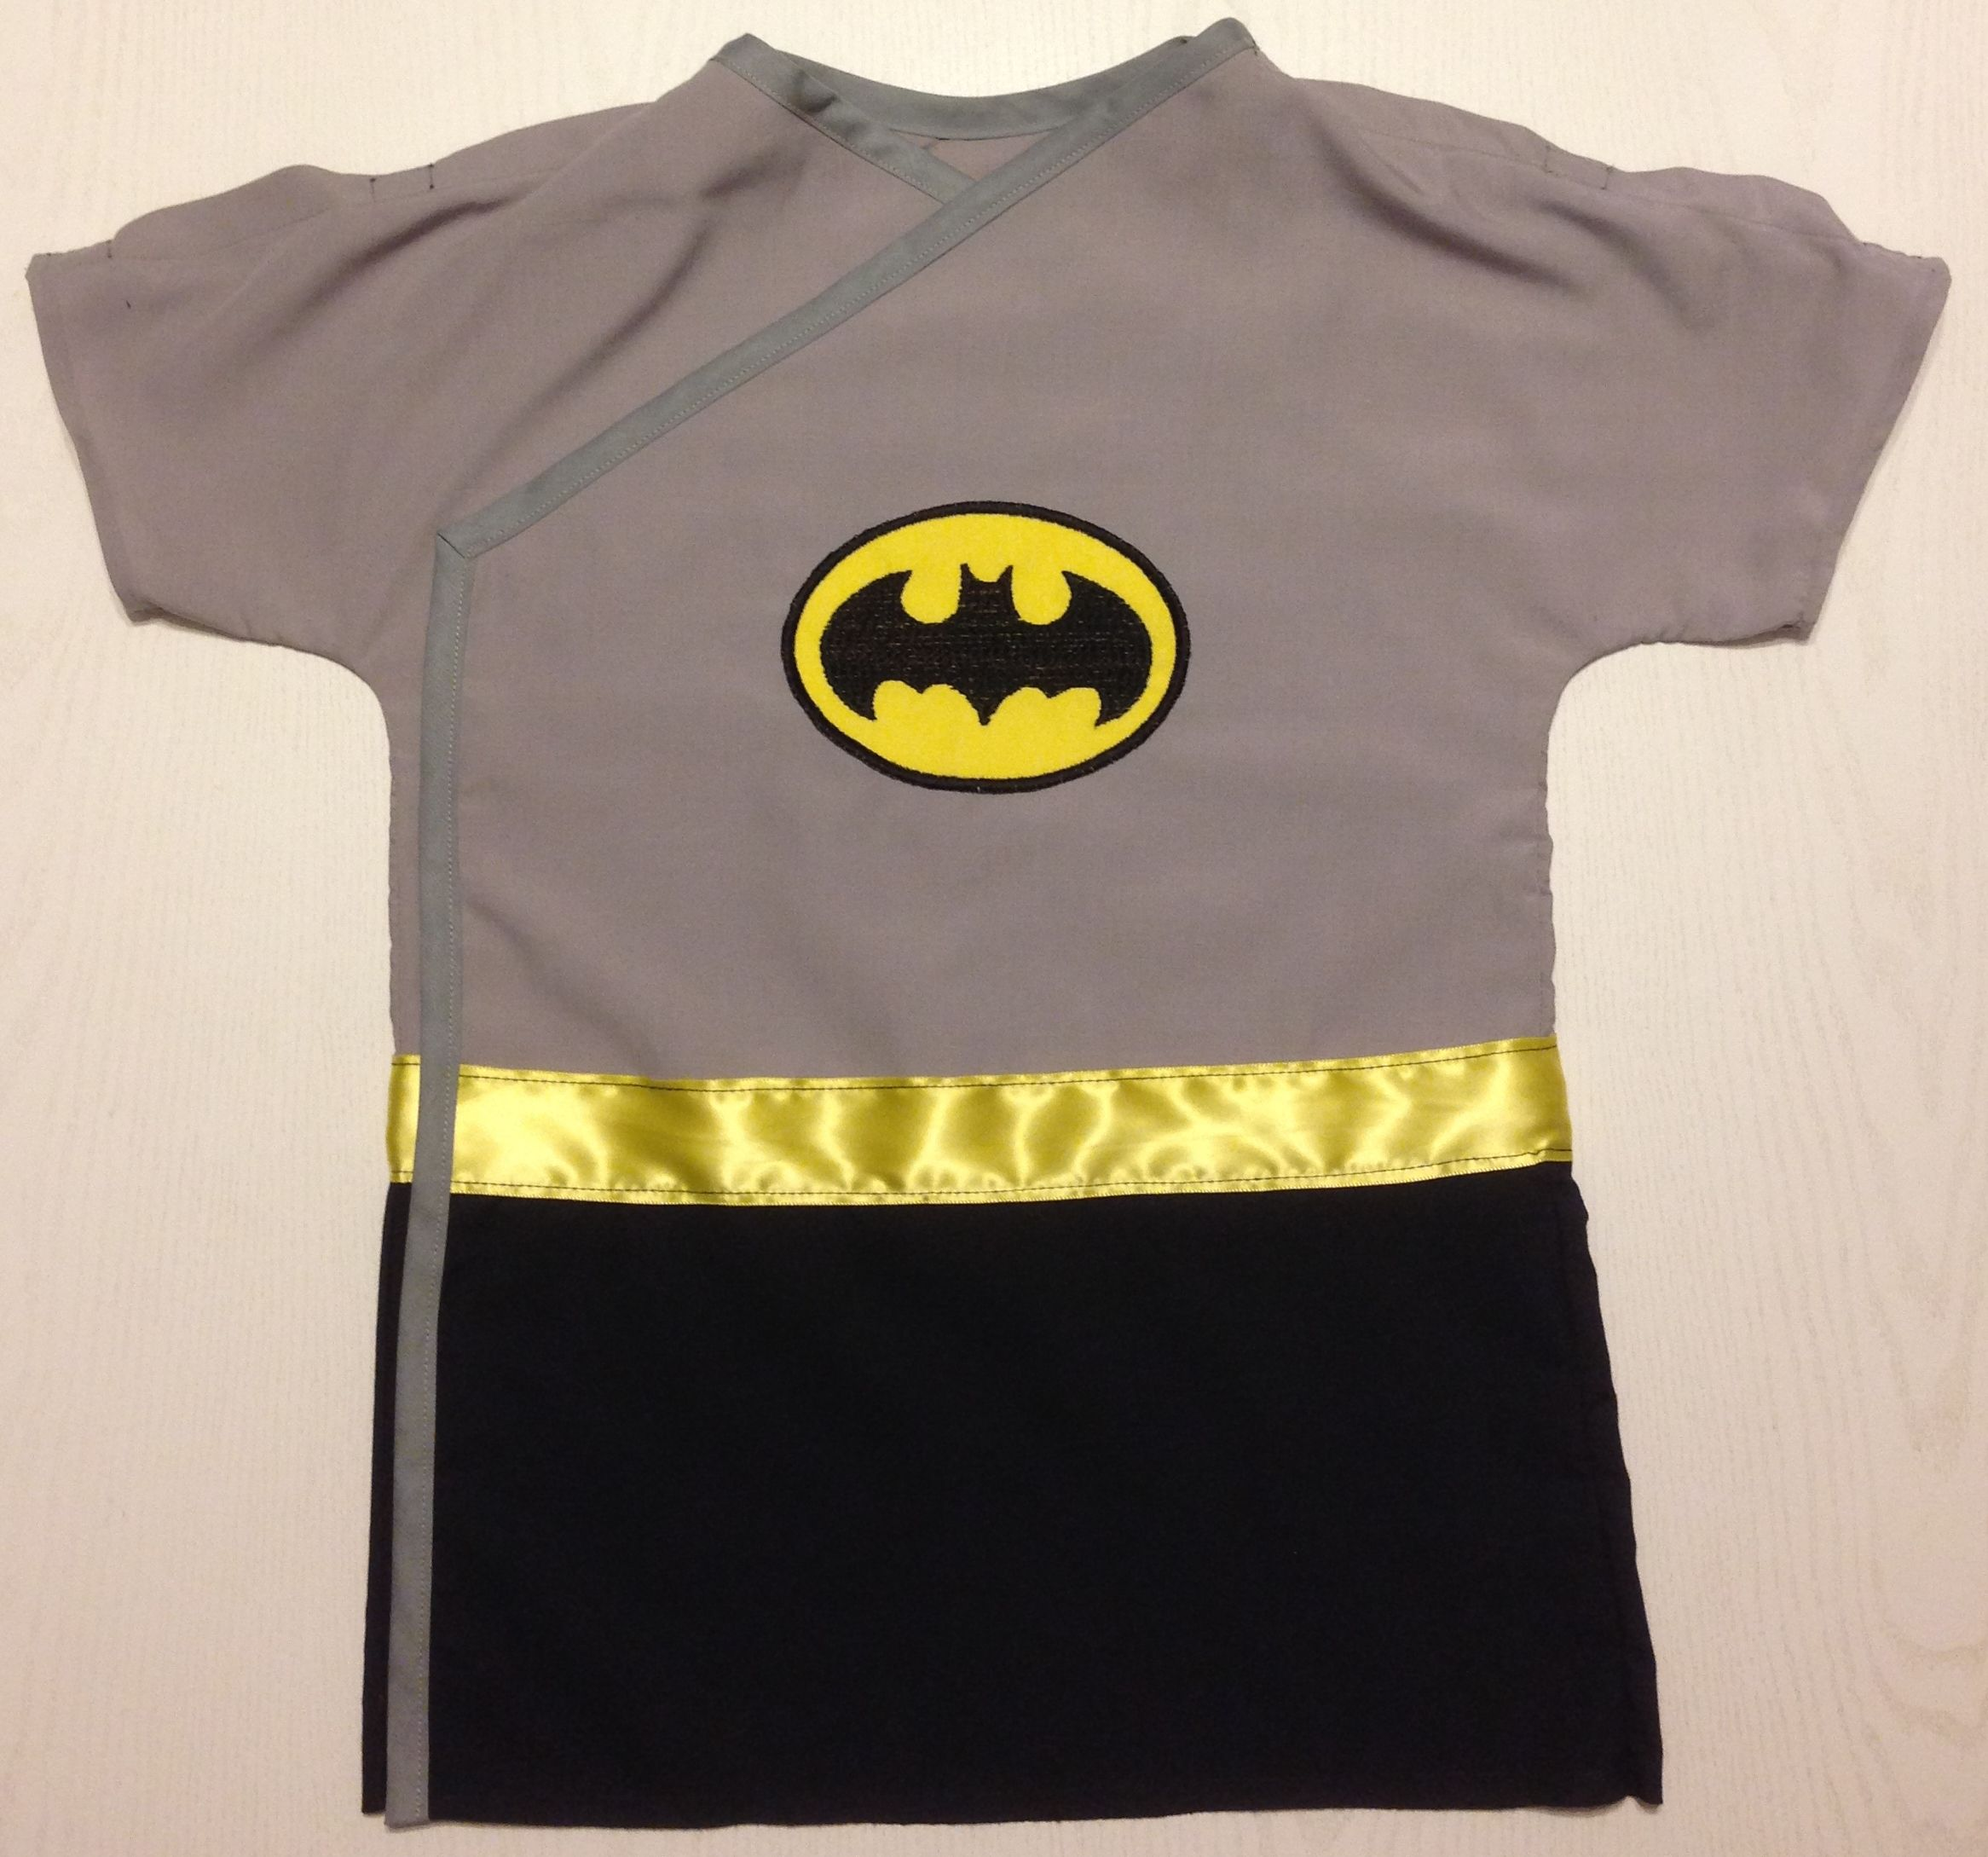 Superhero Batman IV Hospital Gown | Children\'s Hospital Gowns in ...